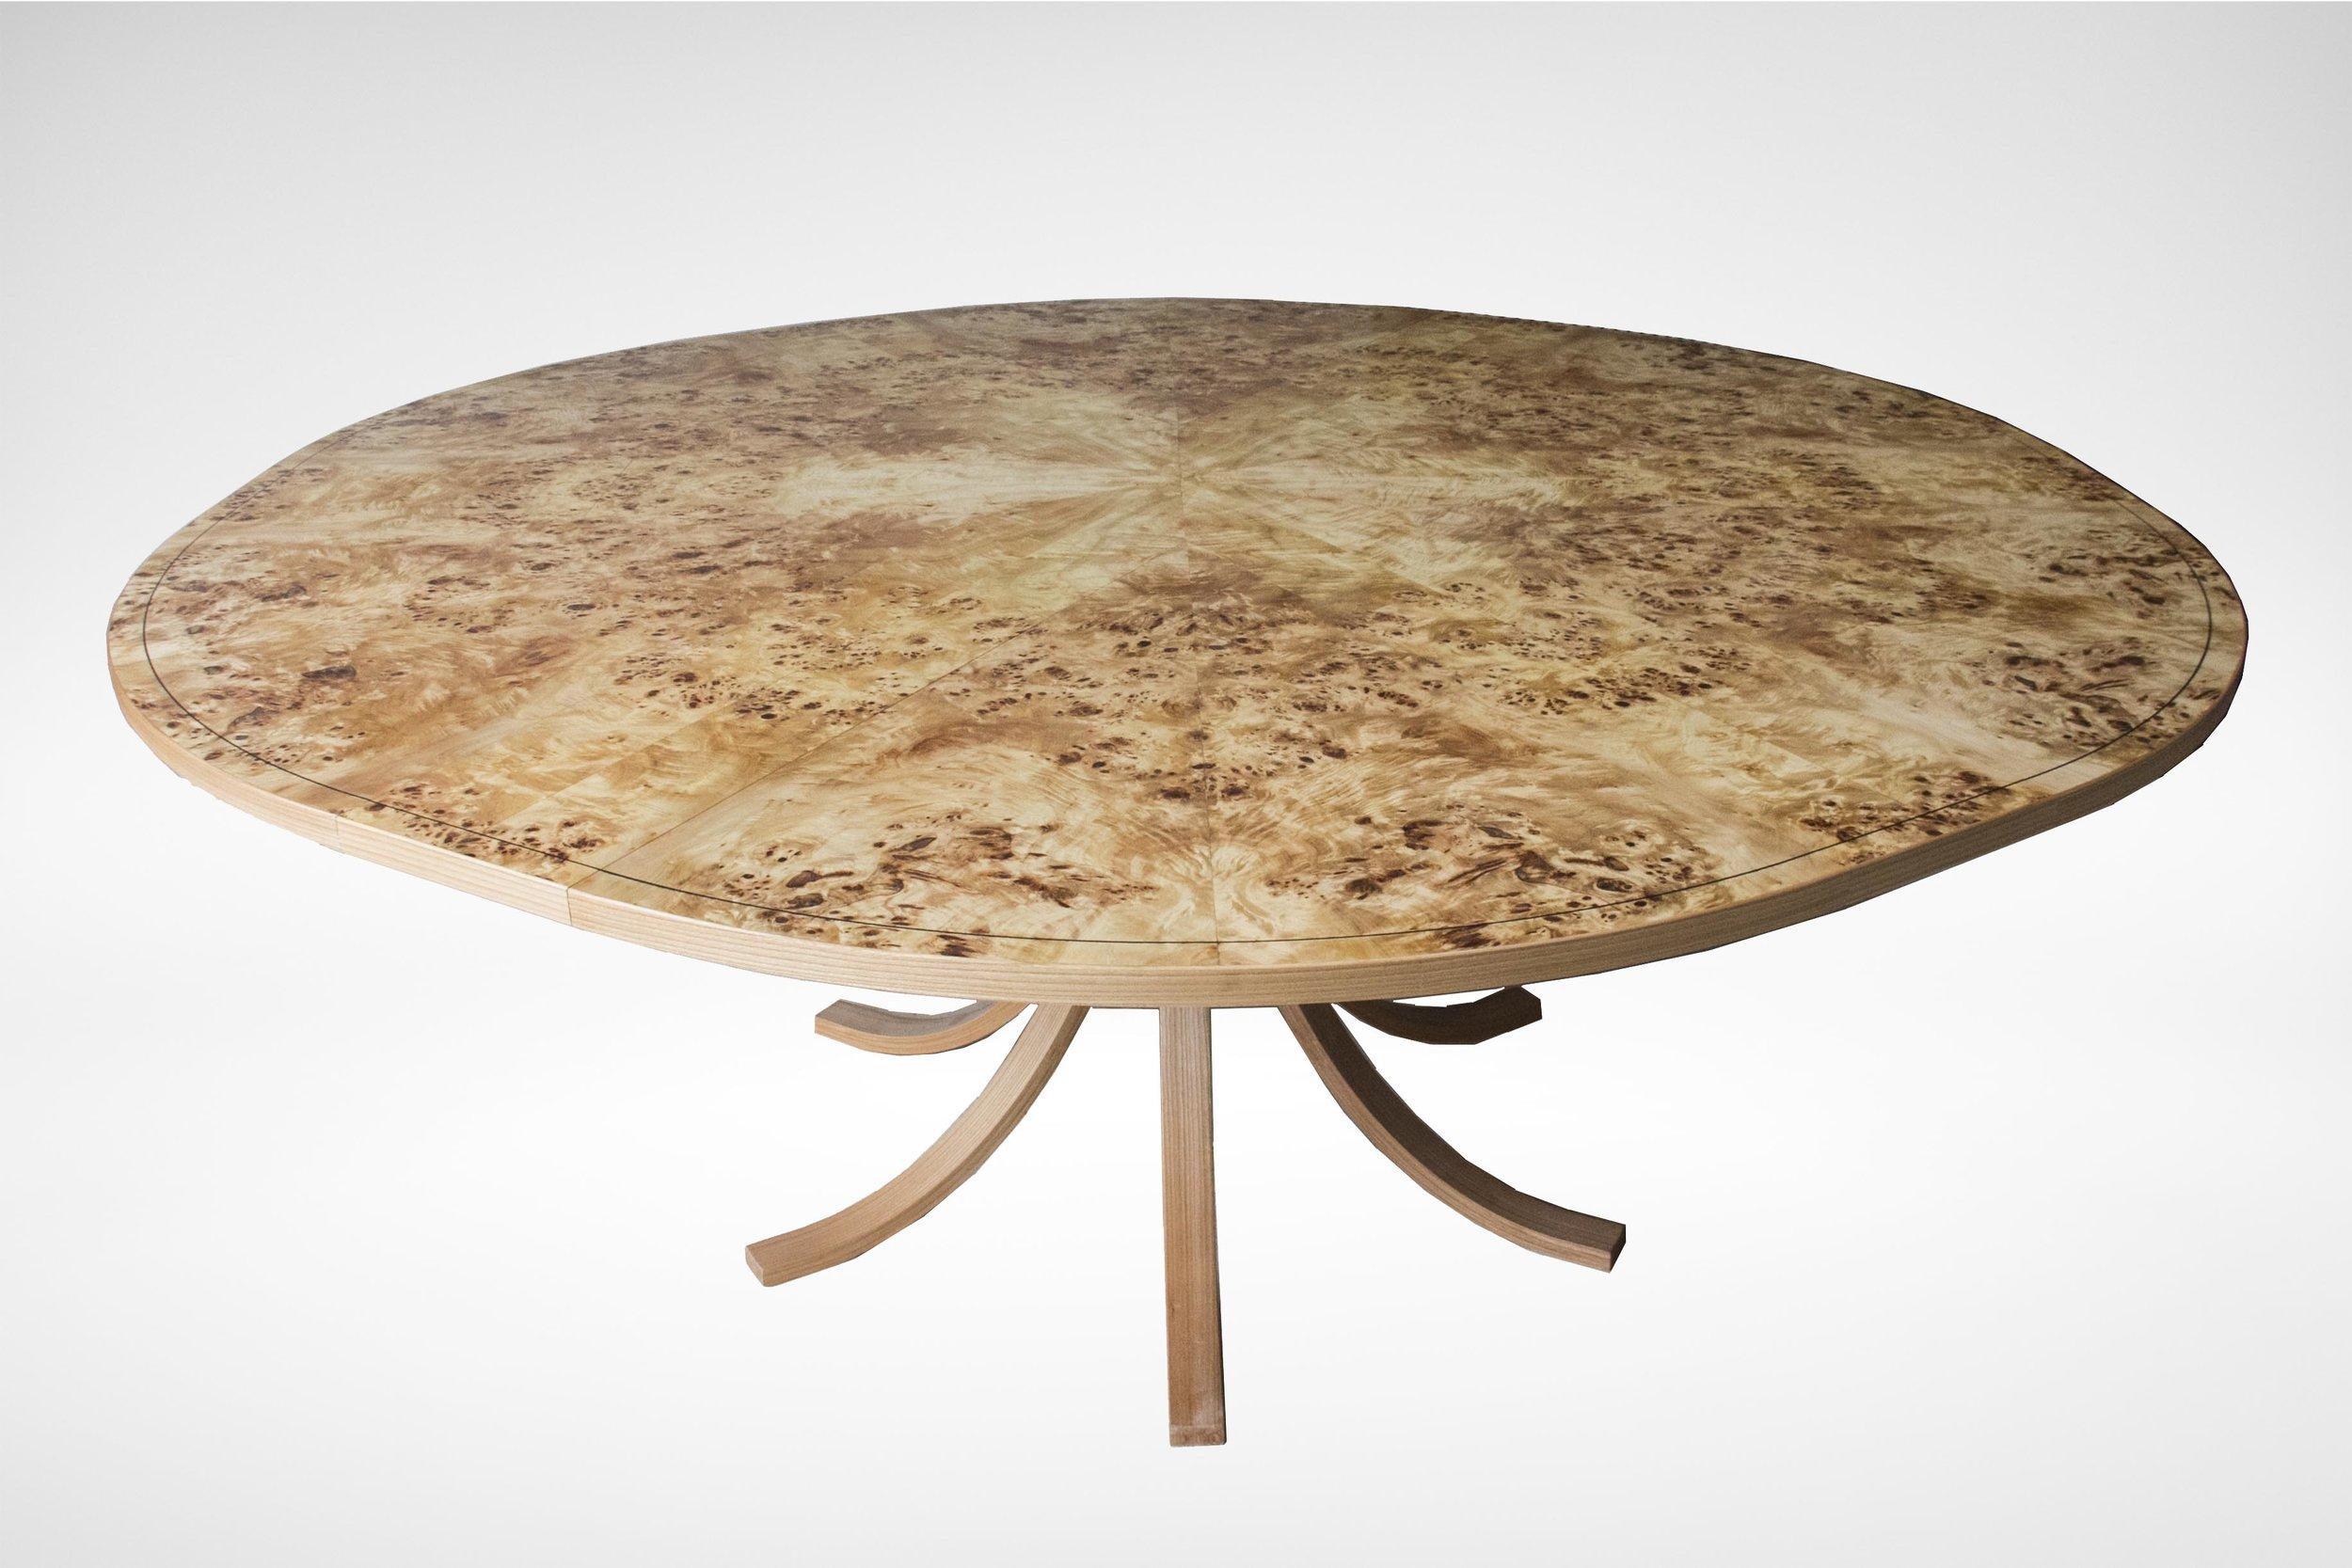 Johnson Furniture - Burr poplar and elm dining table 04.jpg